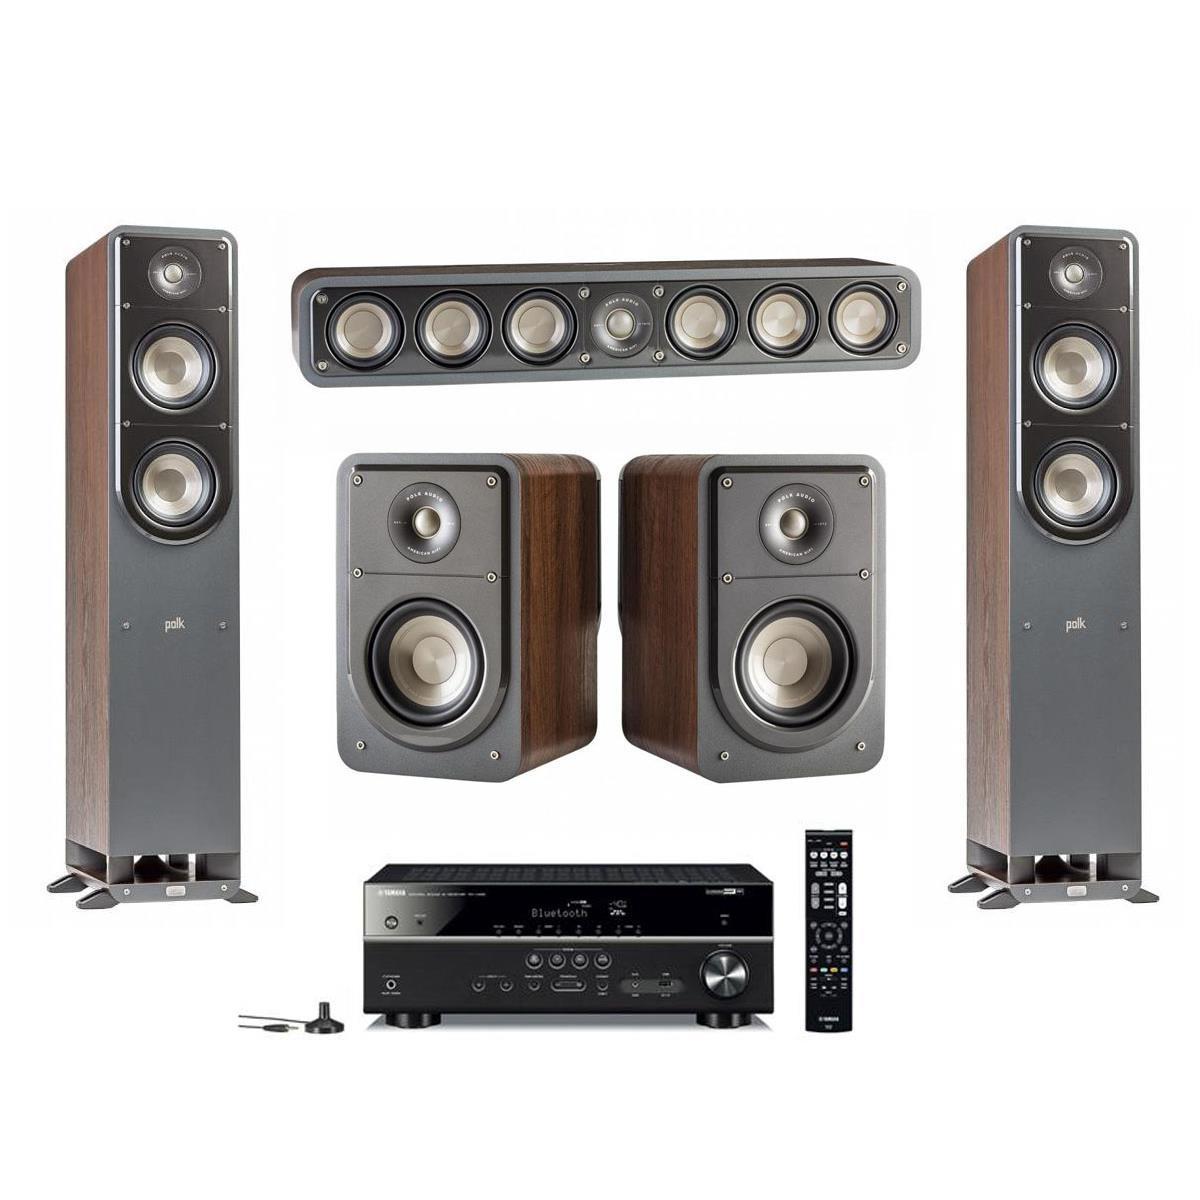 Polk Signature Speakers 2x S50 S35 S15 Yamaha RX V485 Receiver